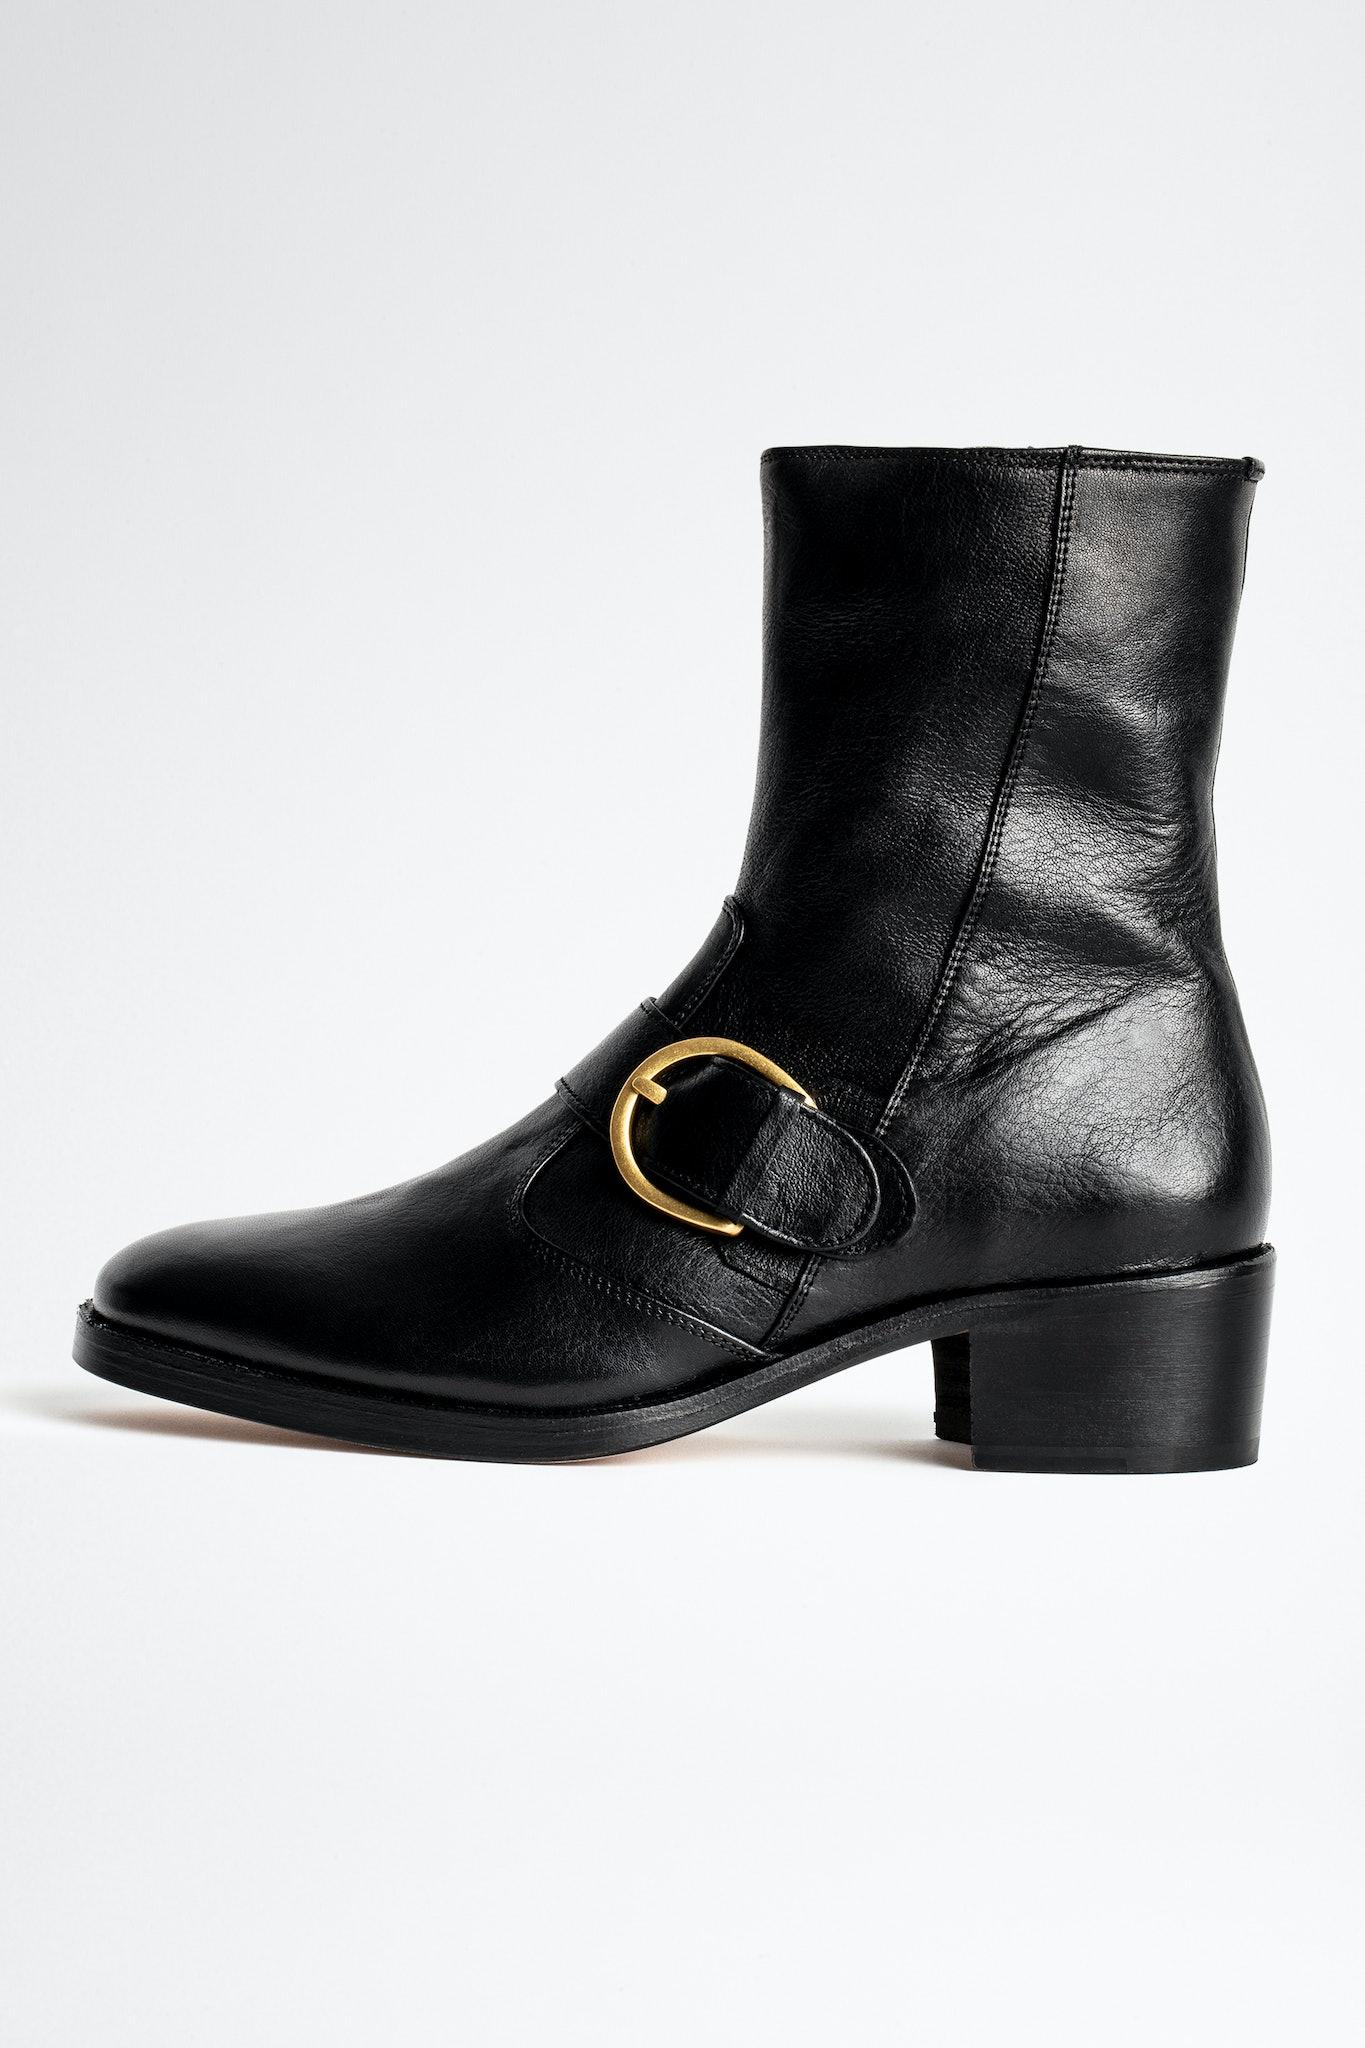 Preiser Buckle Boots